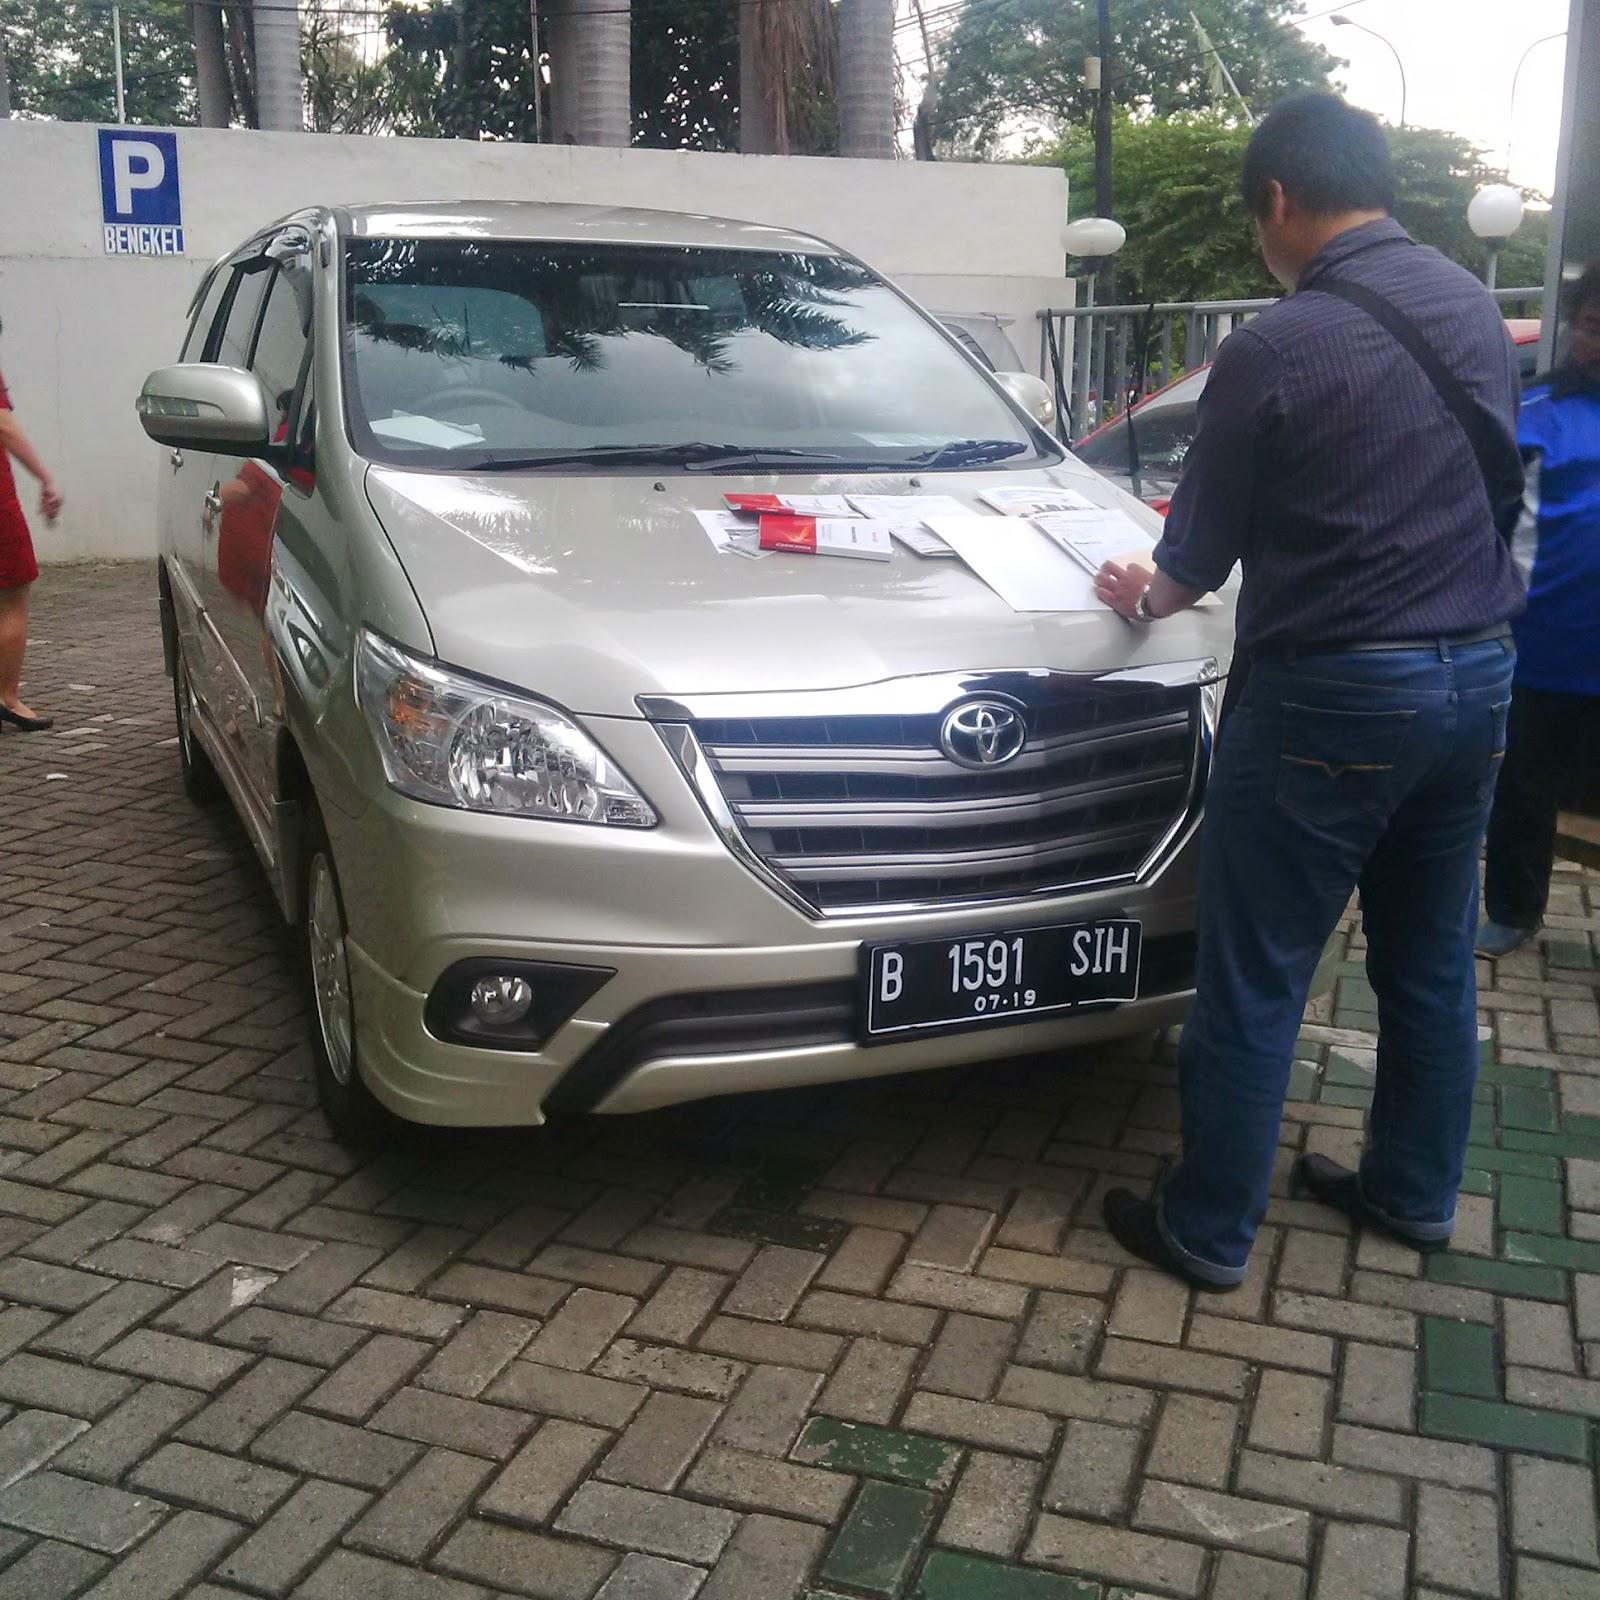 Pengiriman Inova B 1591 SIH Jakarta ke Ambon